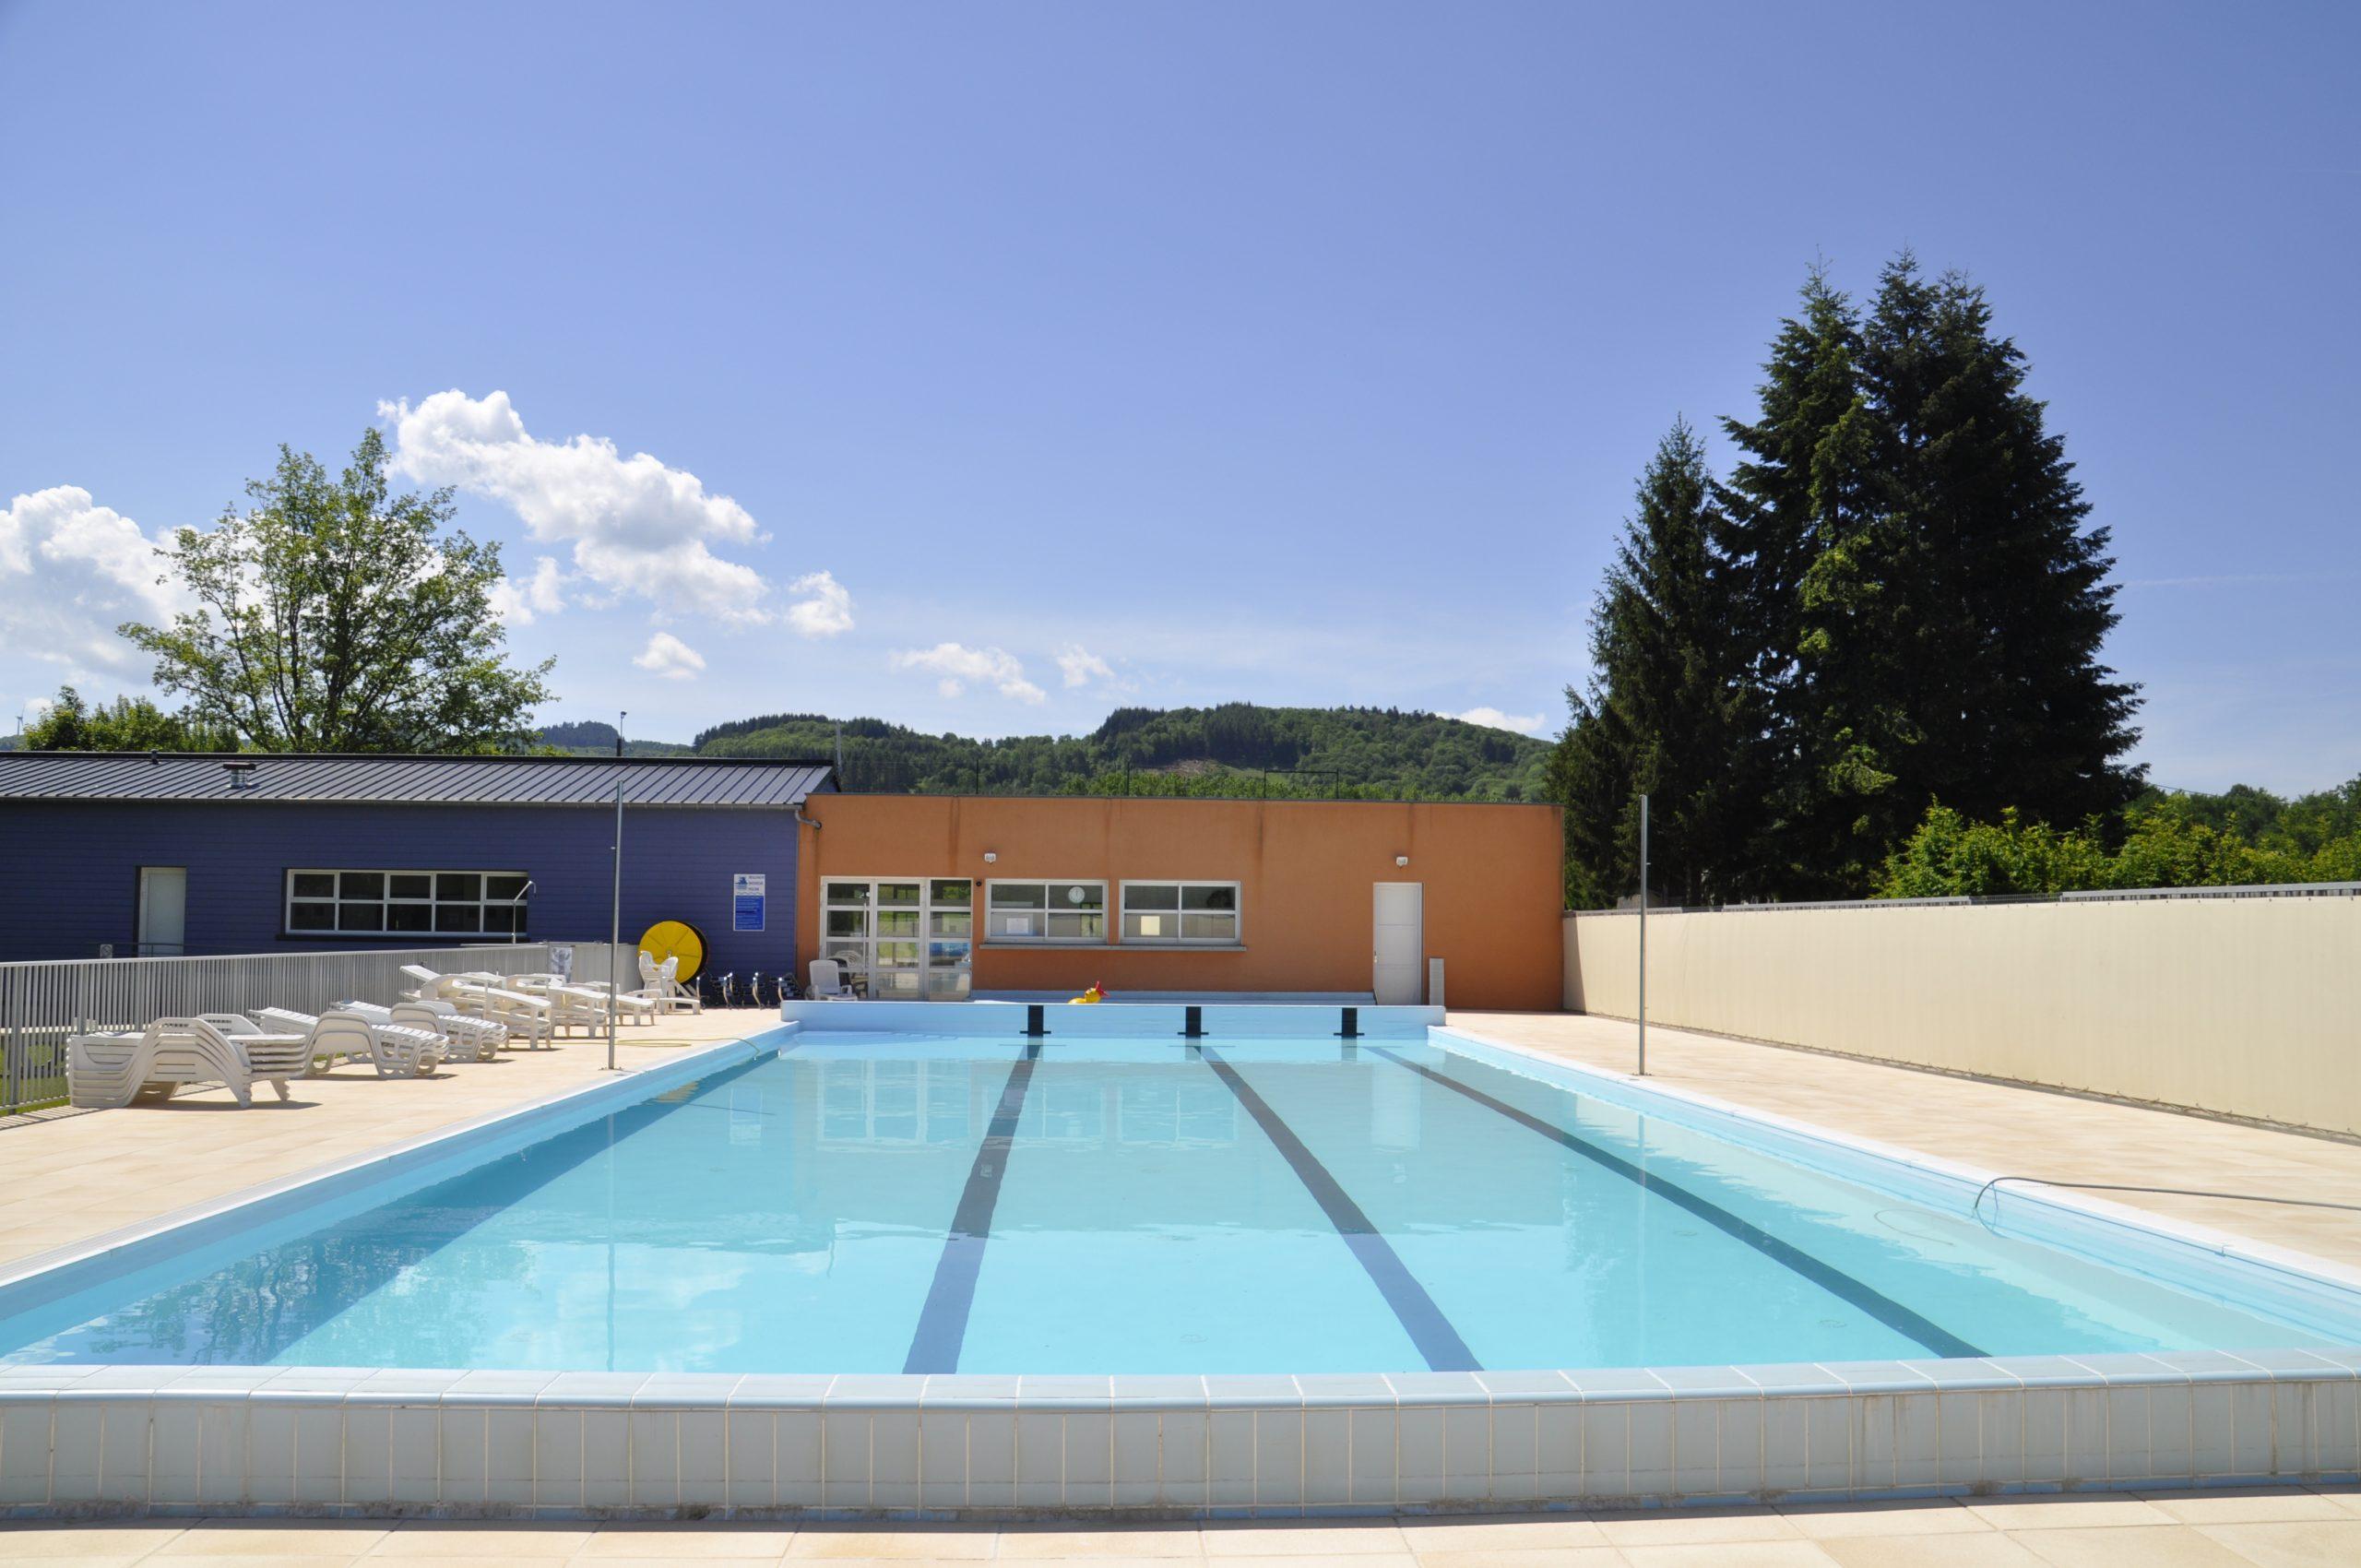 Piscine Du Mayet-De-Montagne - Stade Aquatique concernant Piscine Bellerive Horaire